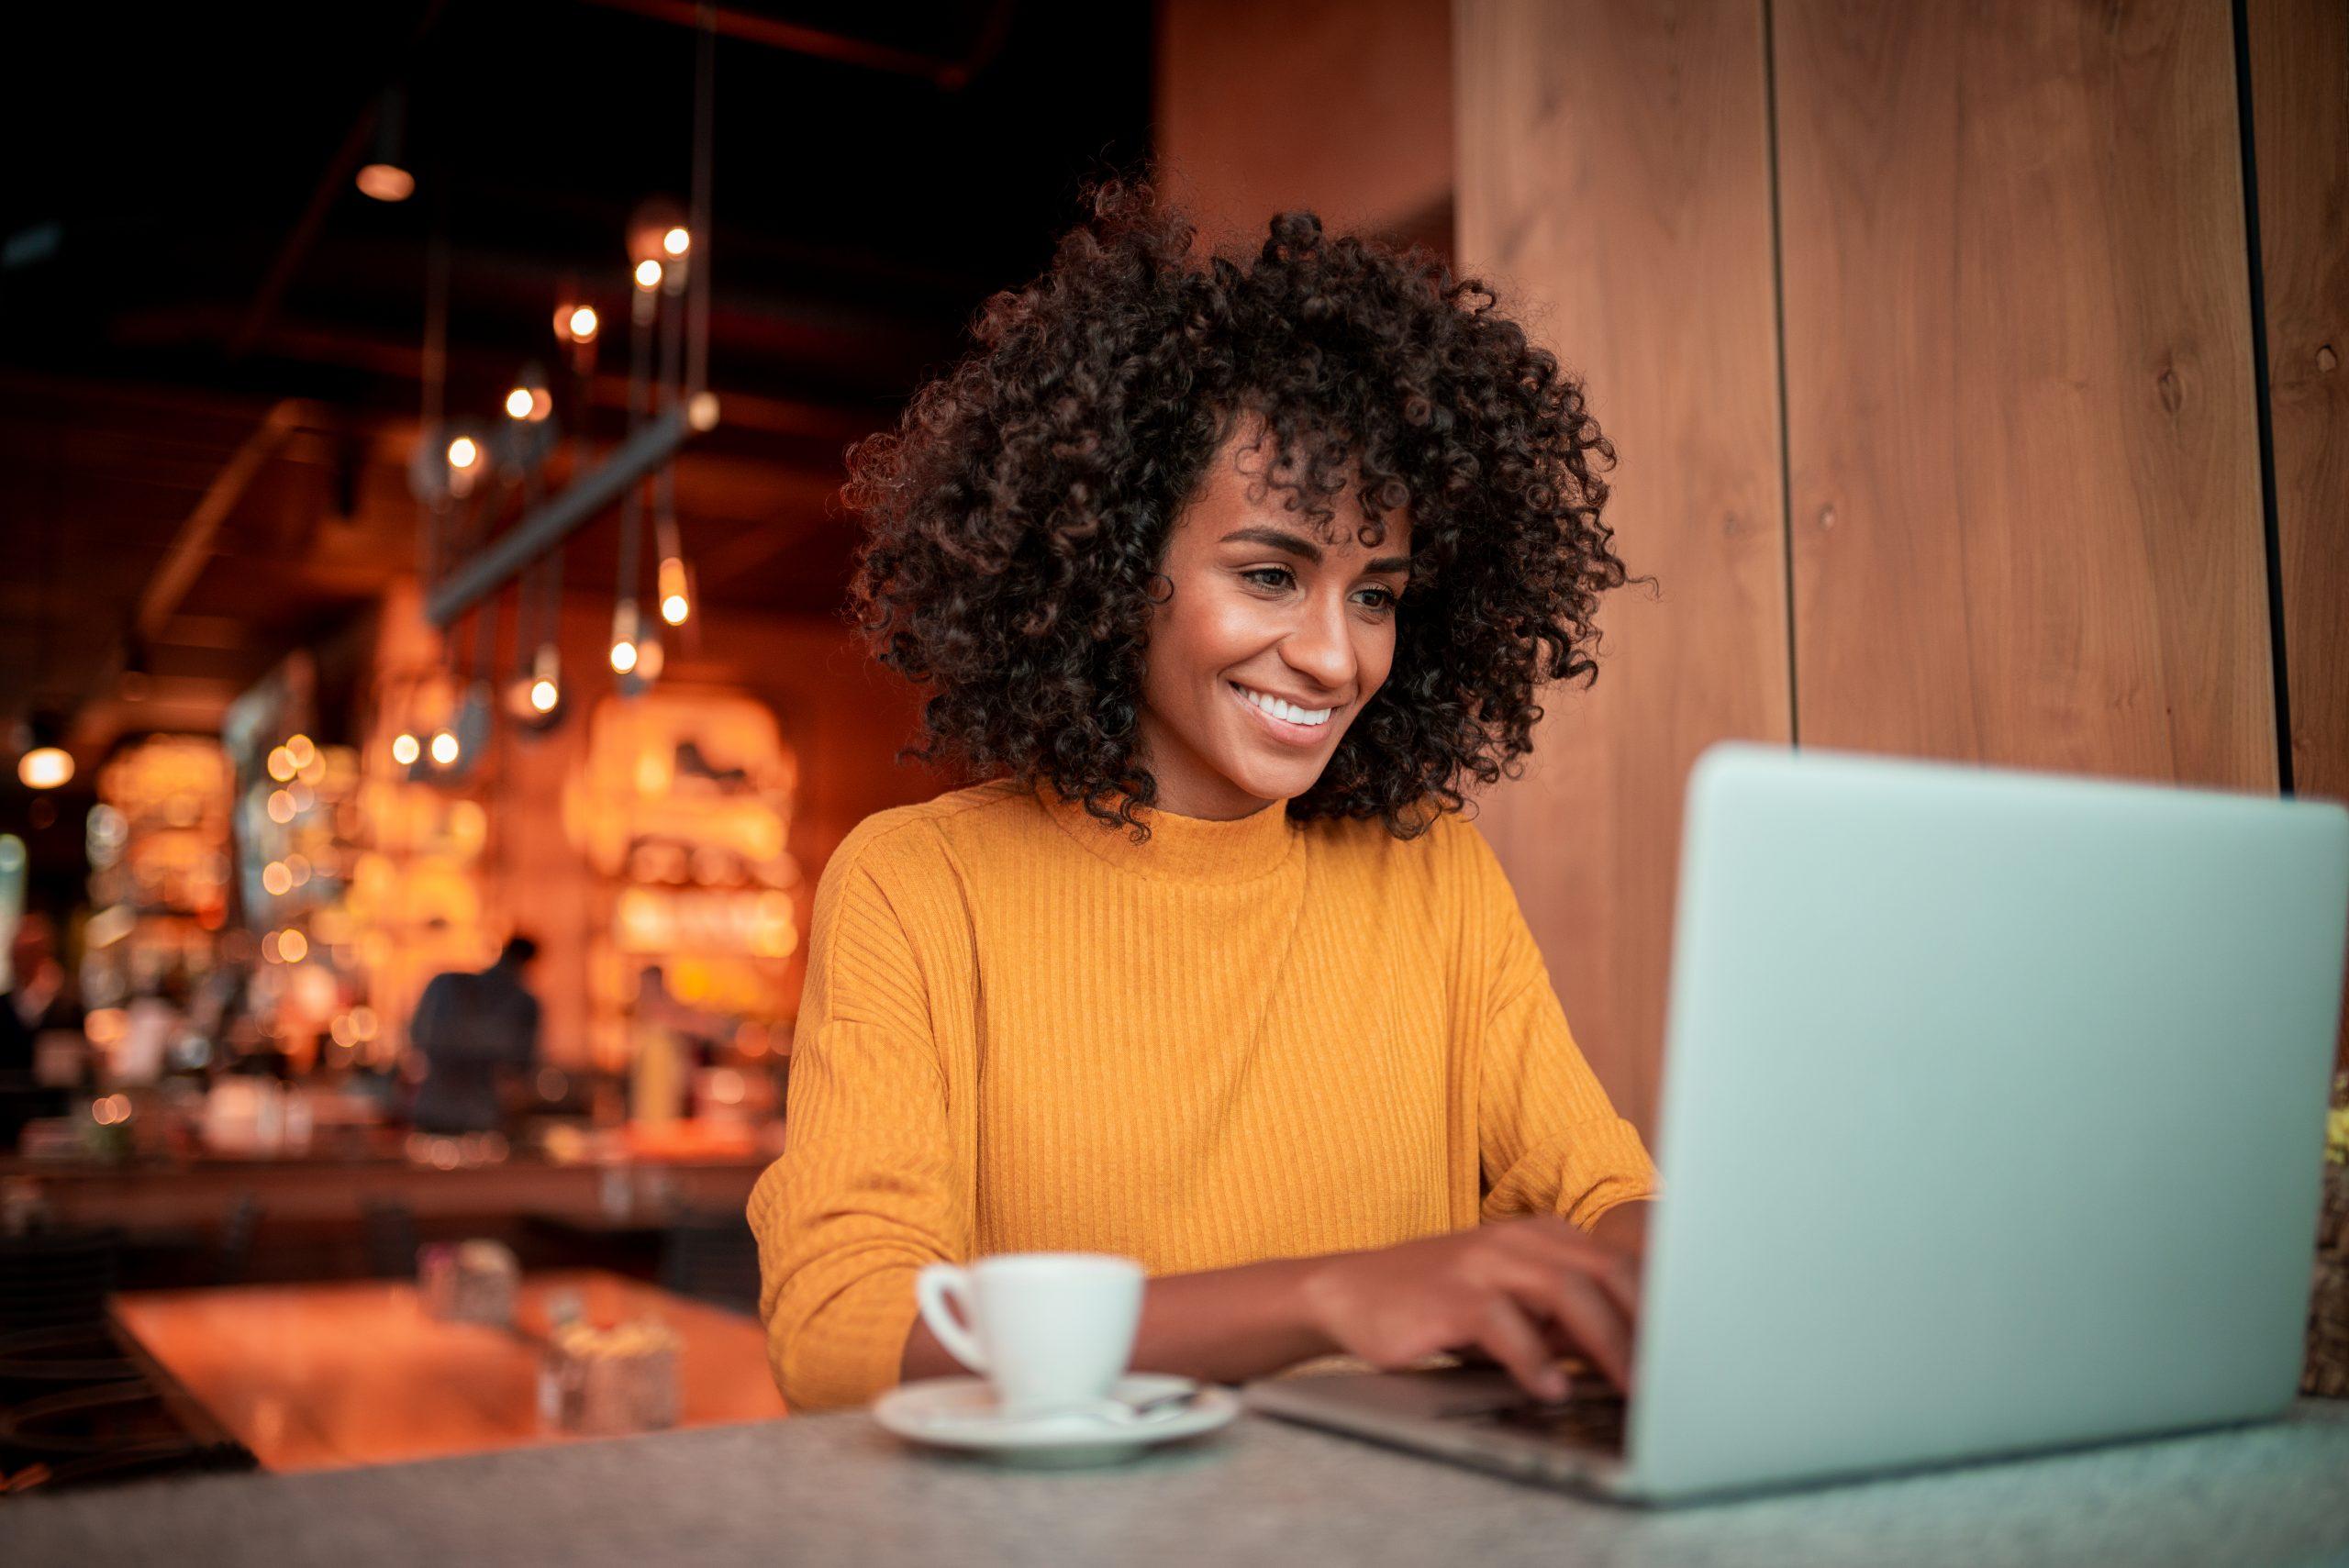 Over freelance en coworking